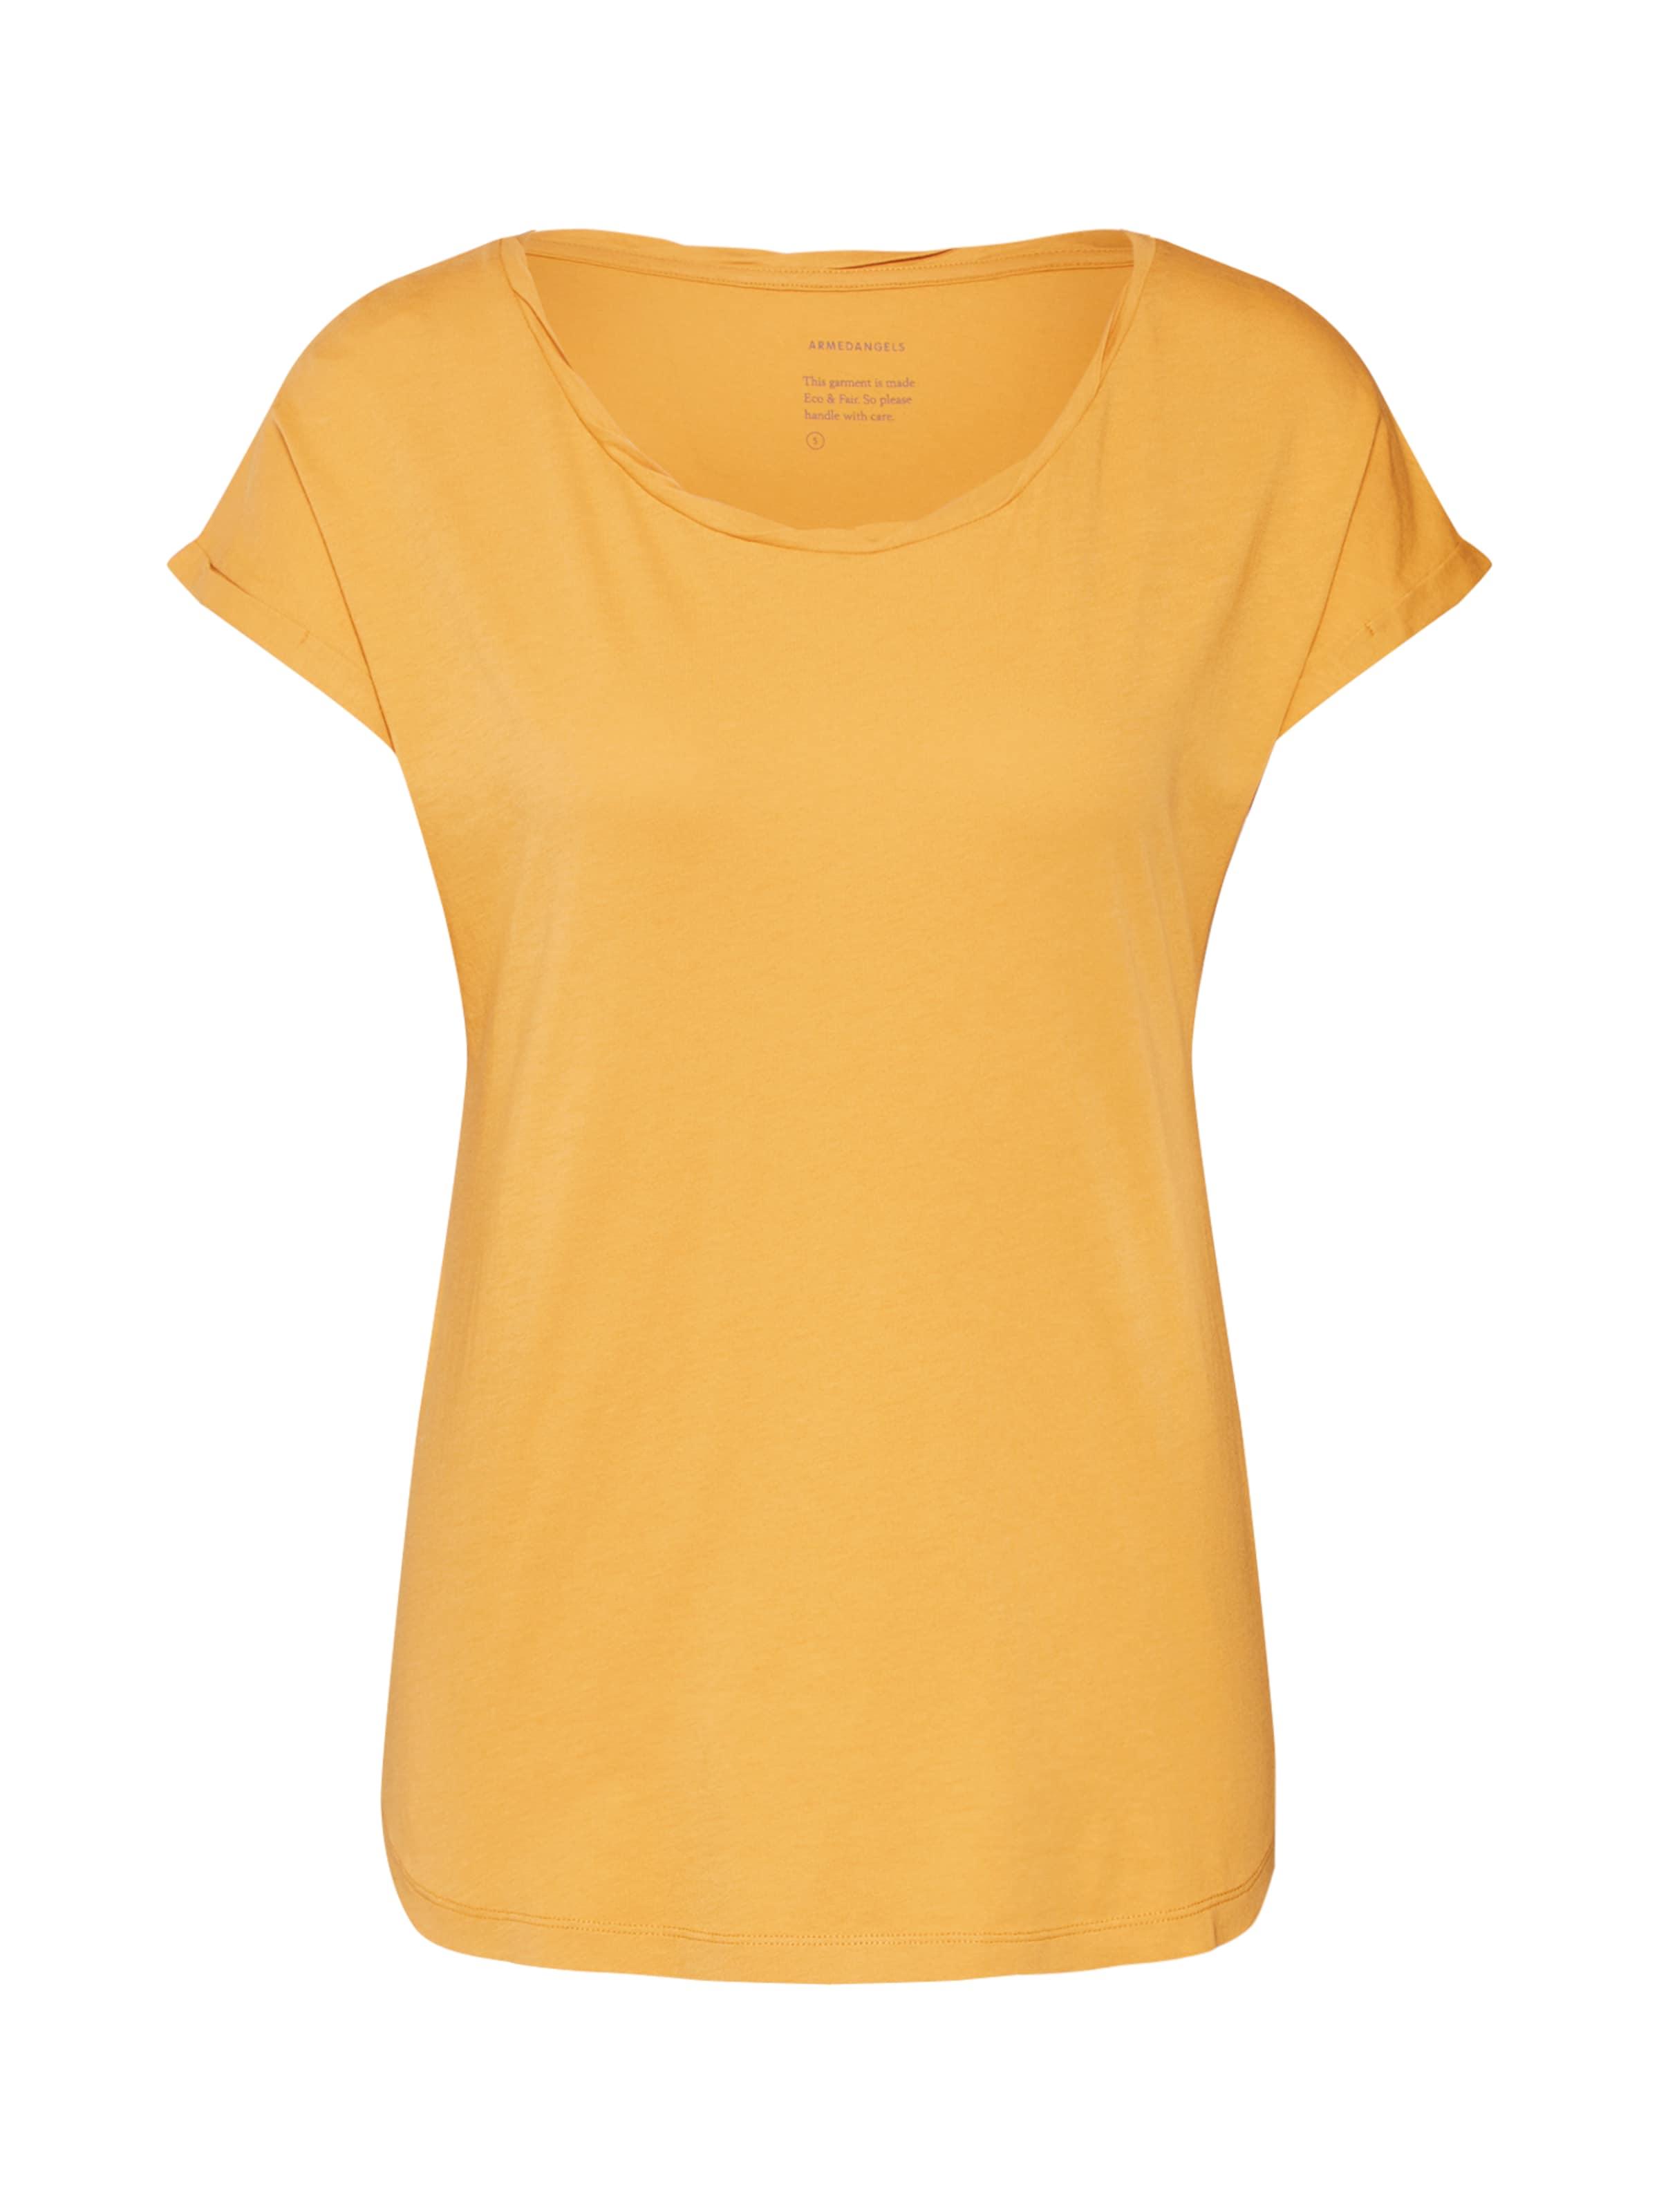 In shirt 'lale' T Armedangels Karamell l1JTFc3K